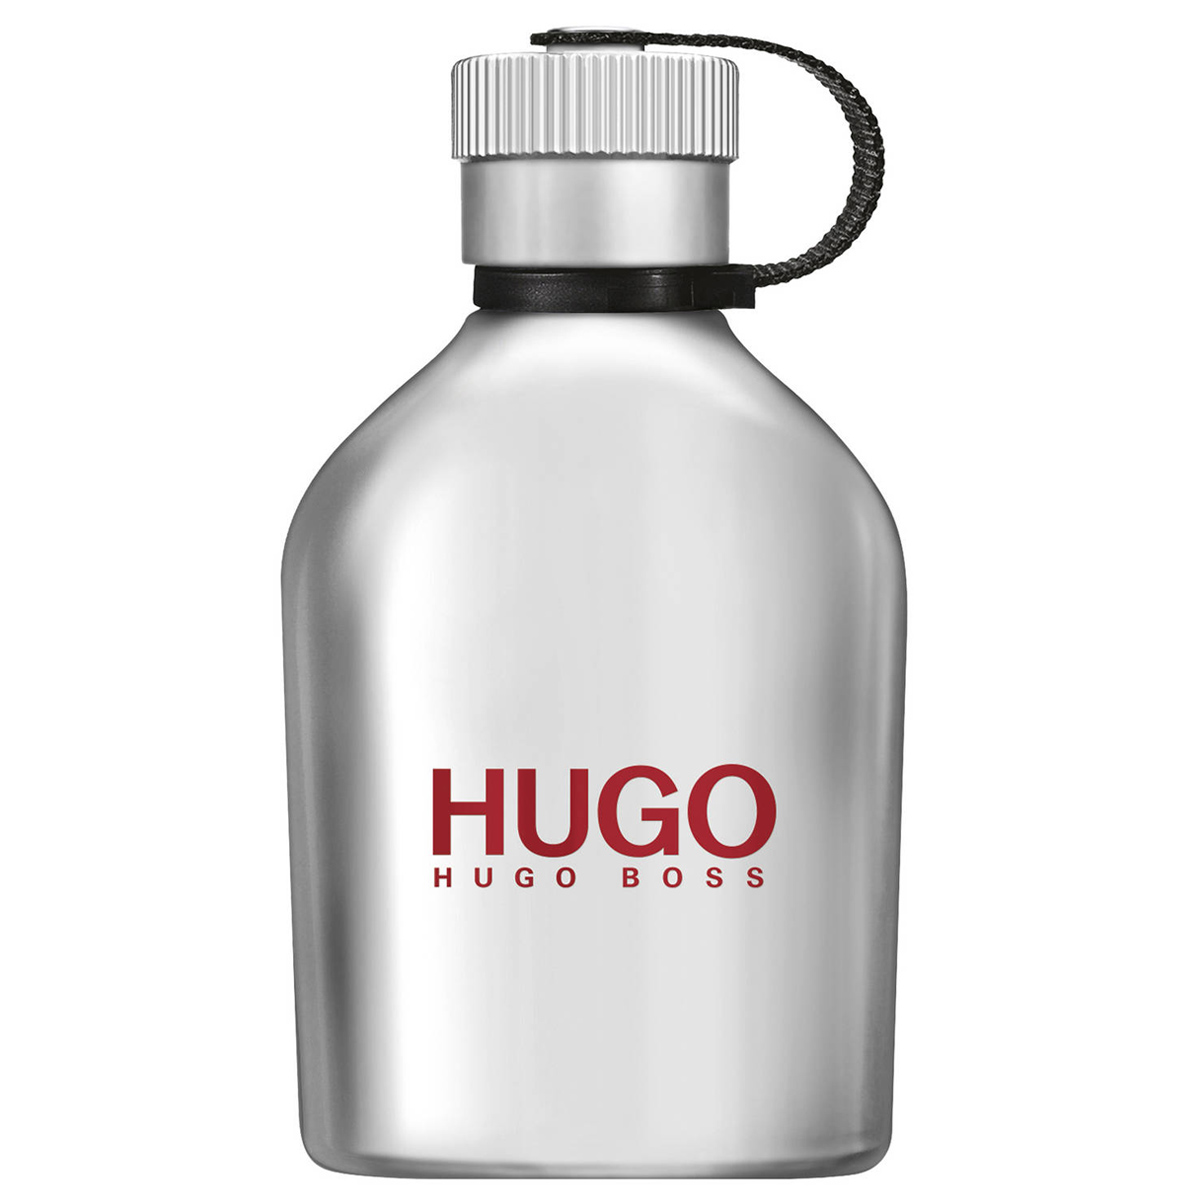 Eau de Toilette Hugo Iced - HUGO BOSS